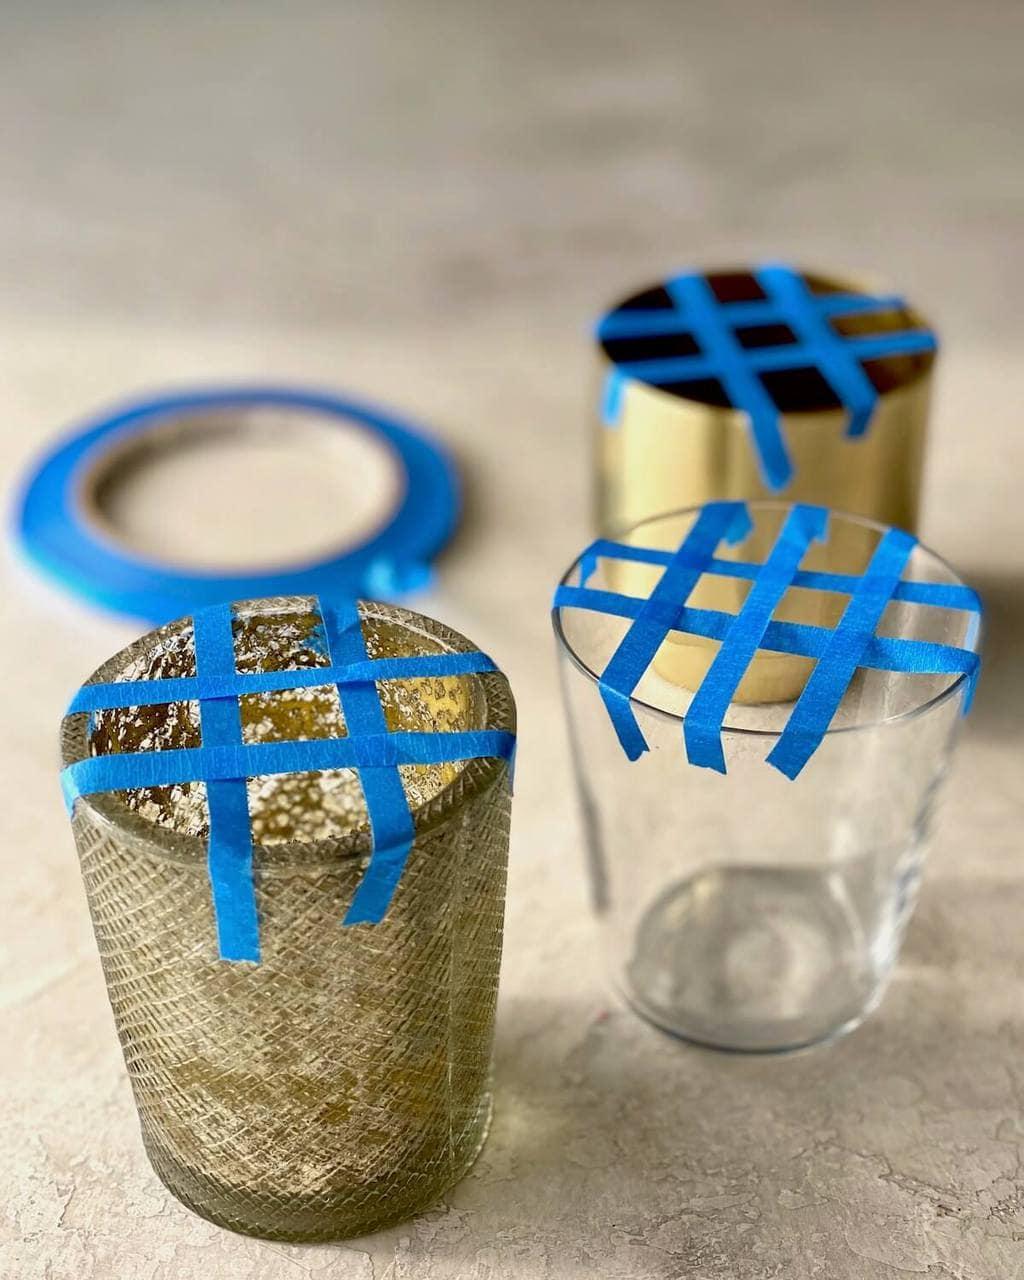 how to make tape grid for flower arranging in little glasses